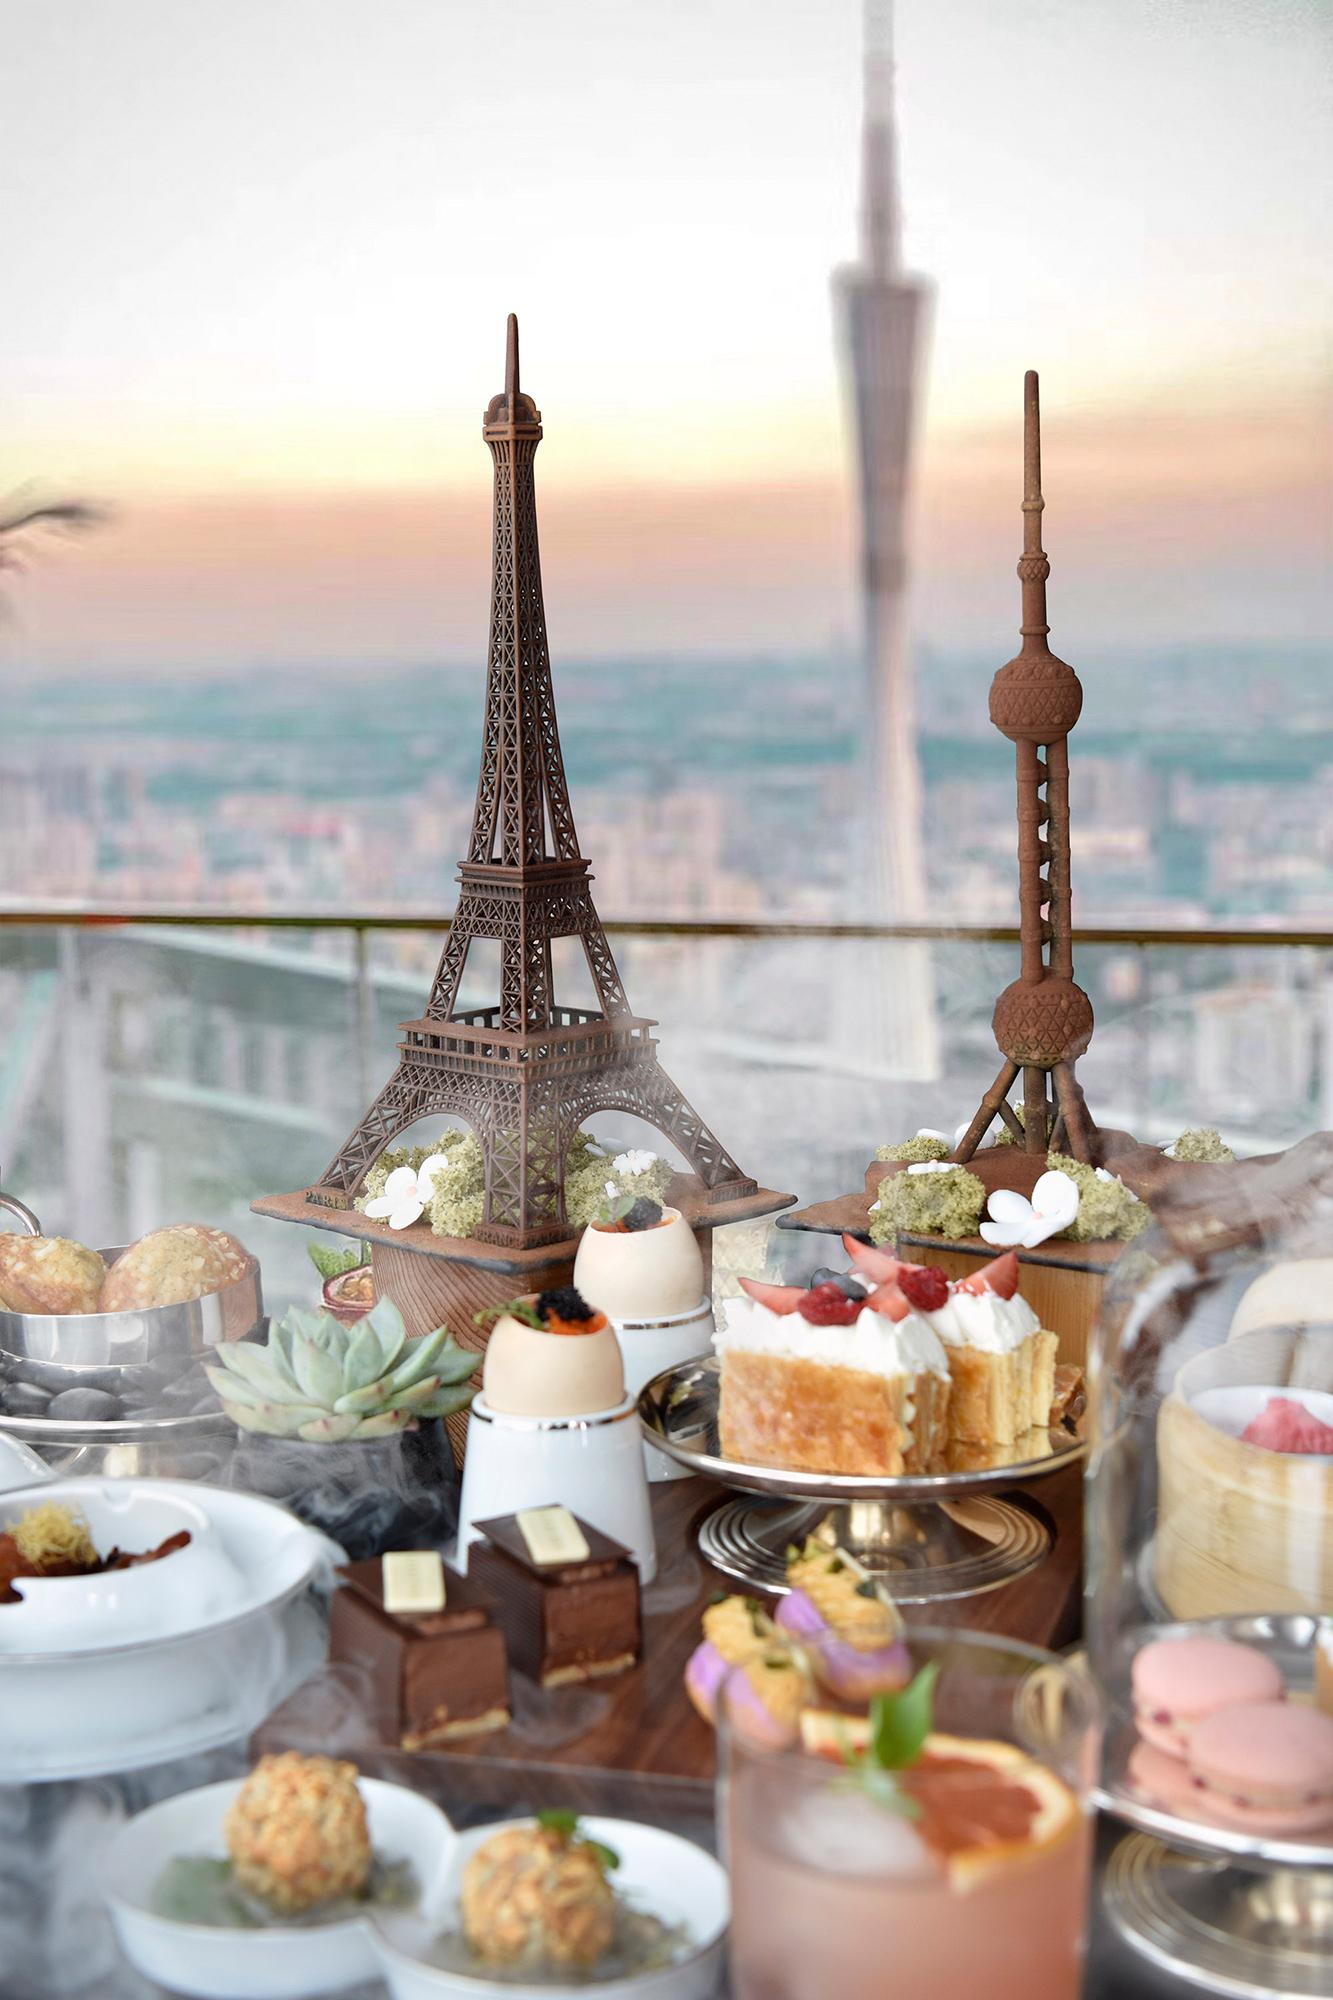 云游:东西方浪漫之都的云端午会 | Wanderlust: Park Hyatt Guangzhou Presents Shanghai Meets Paris Themed Afternoon Tea